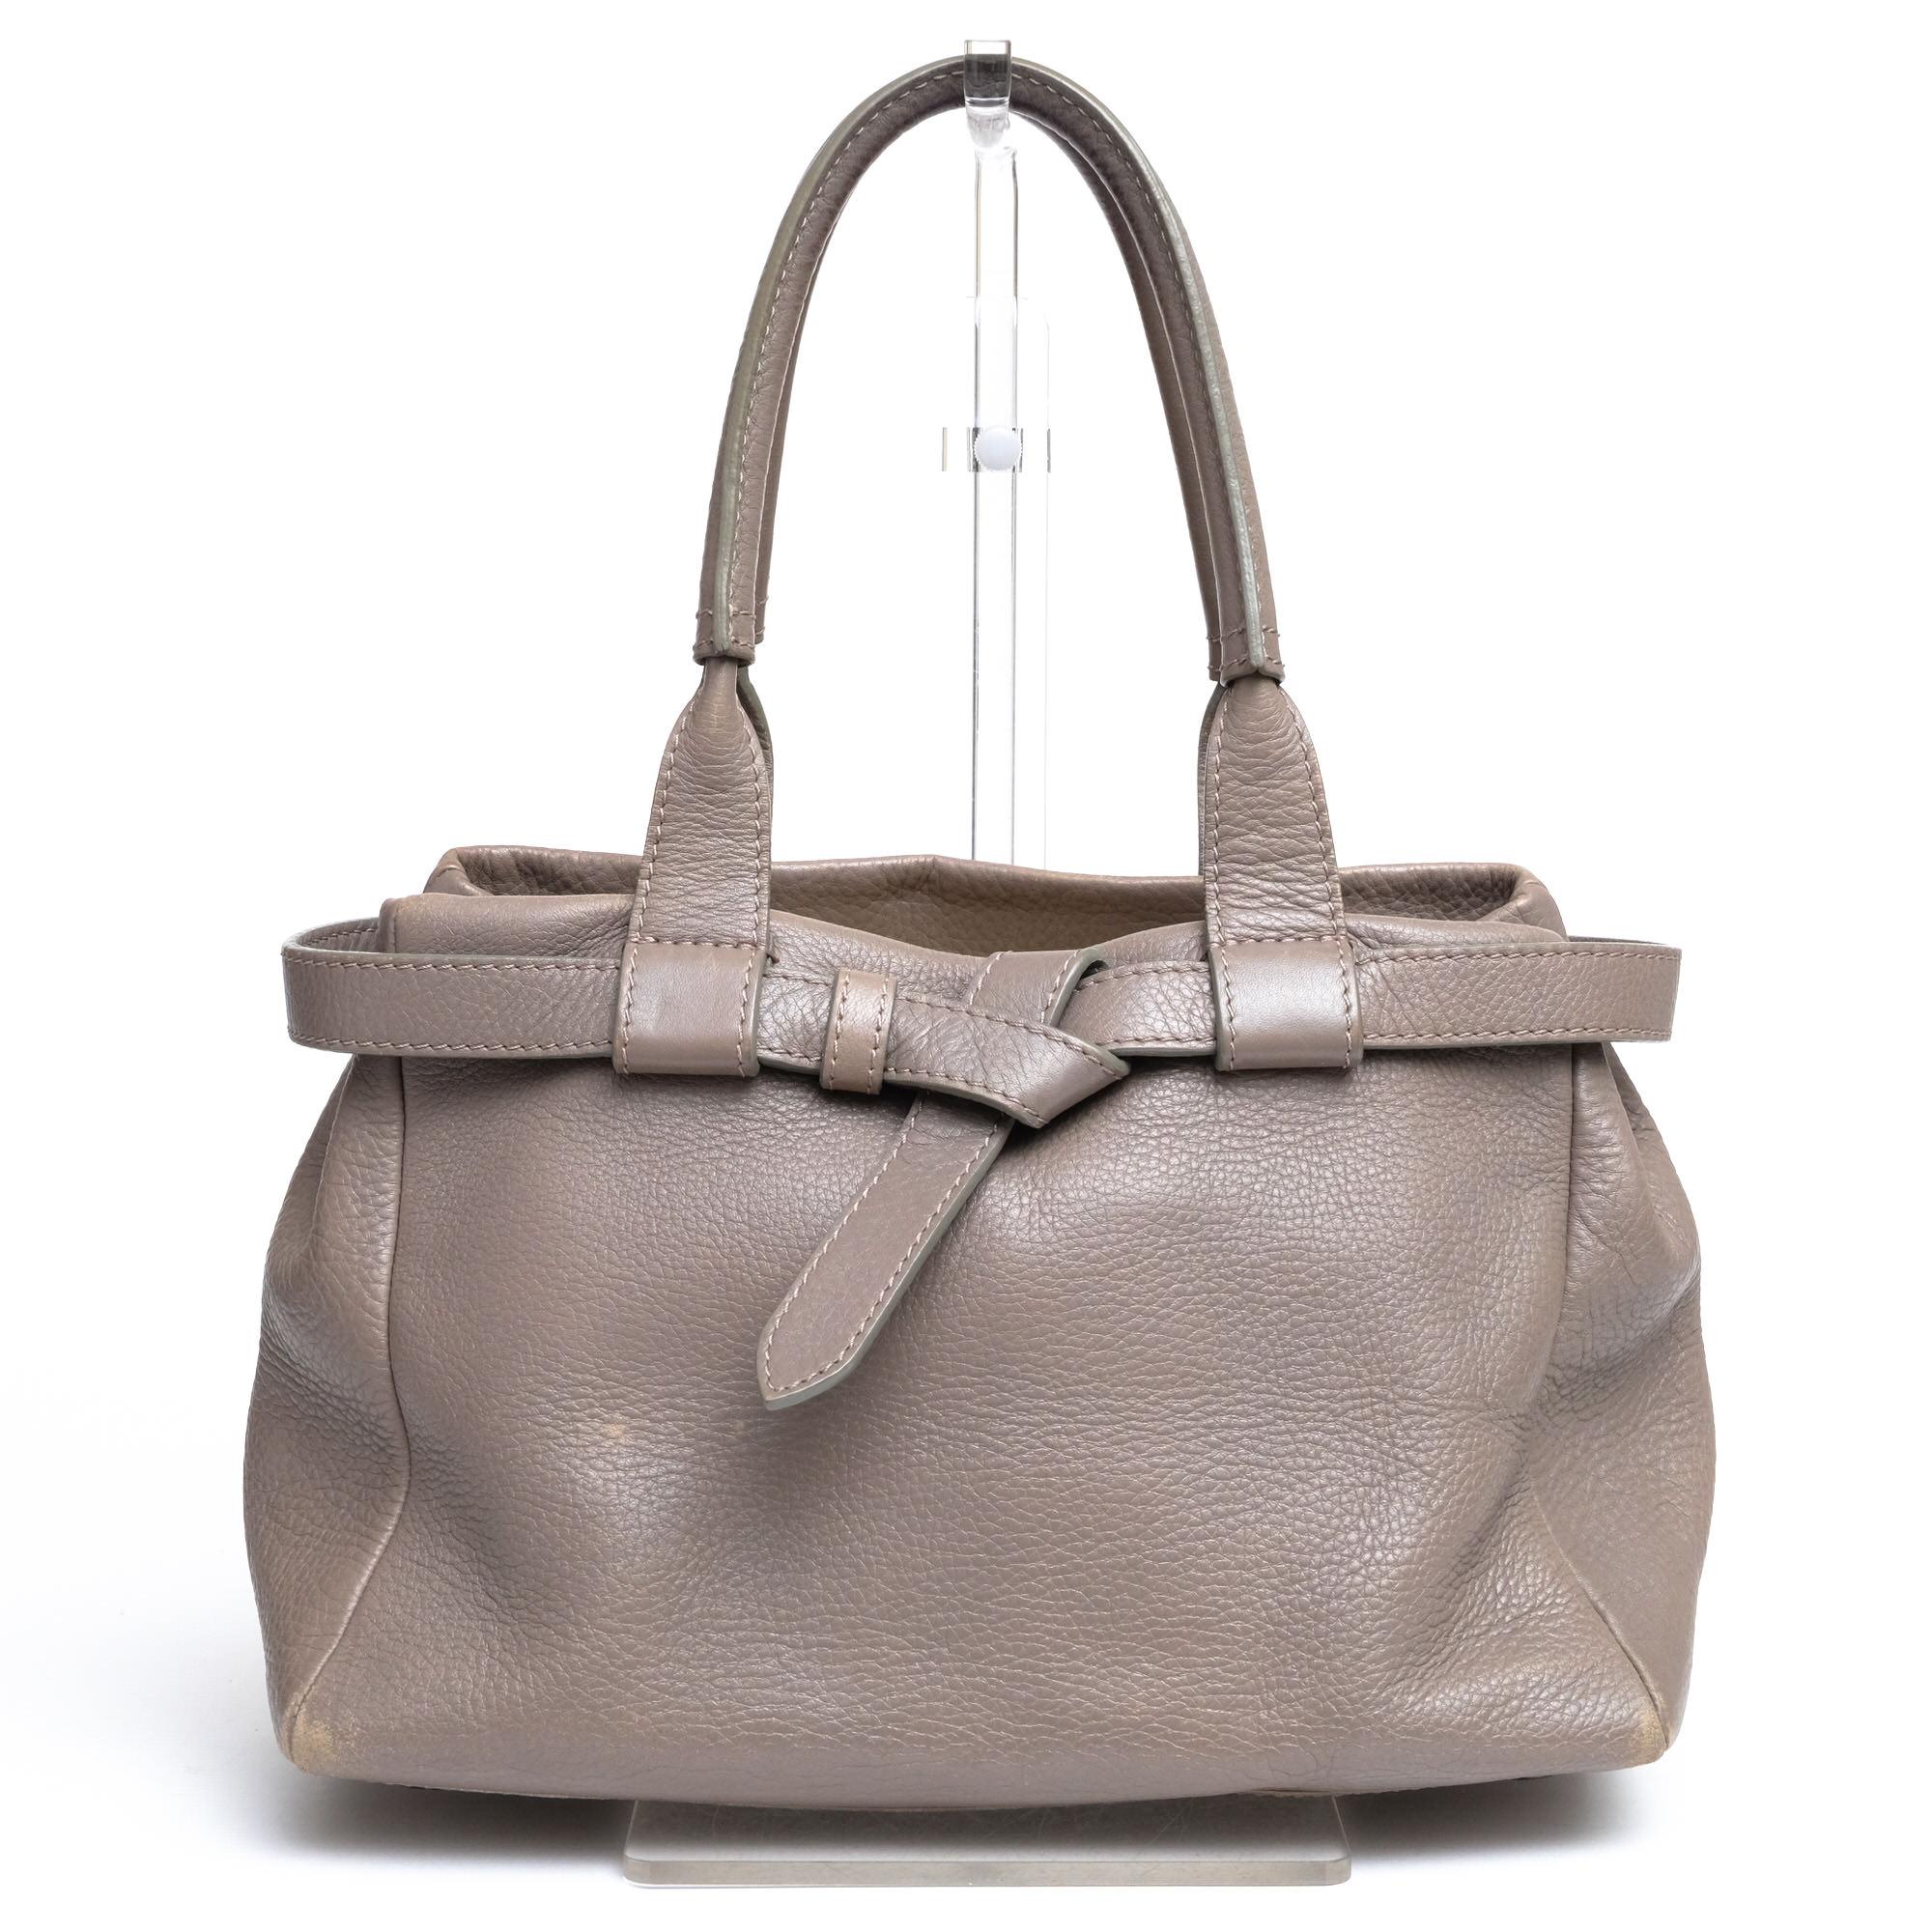 66f0e54877e5 代購代標第一品牌- 樂淘letao - TSUCHIYA-KABAN 土屋鞄ハンドバッグ ...